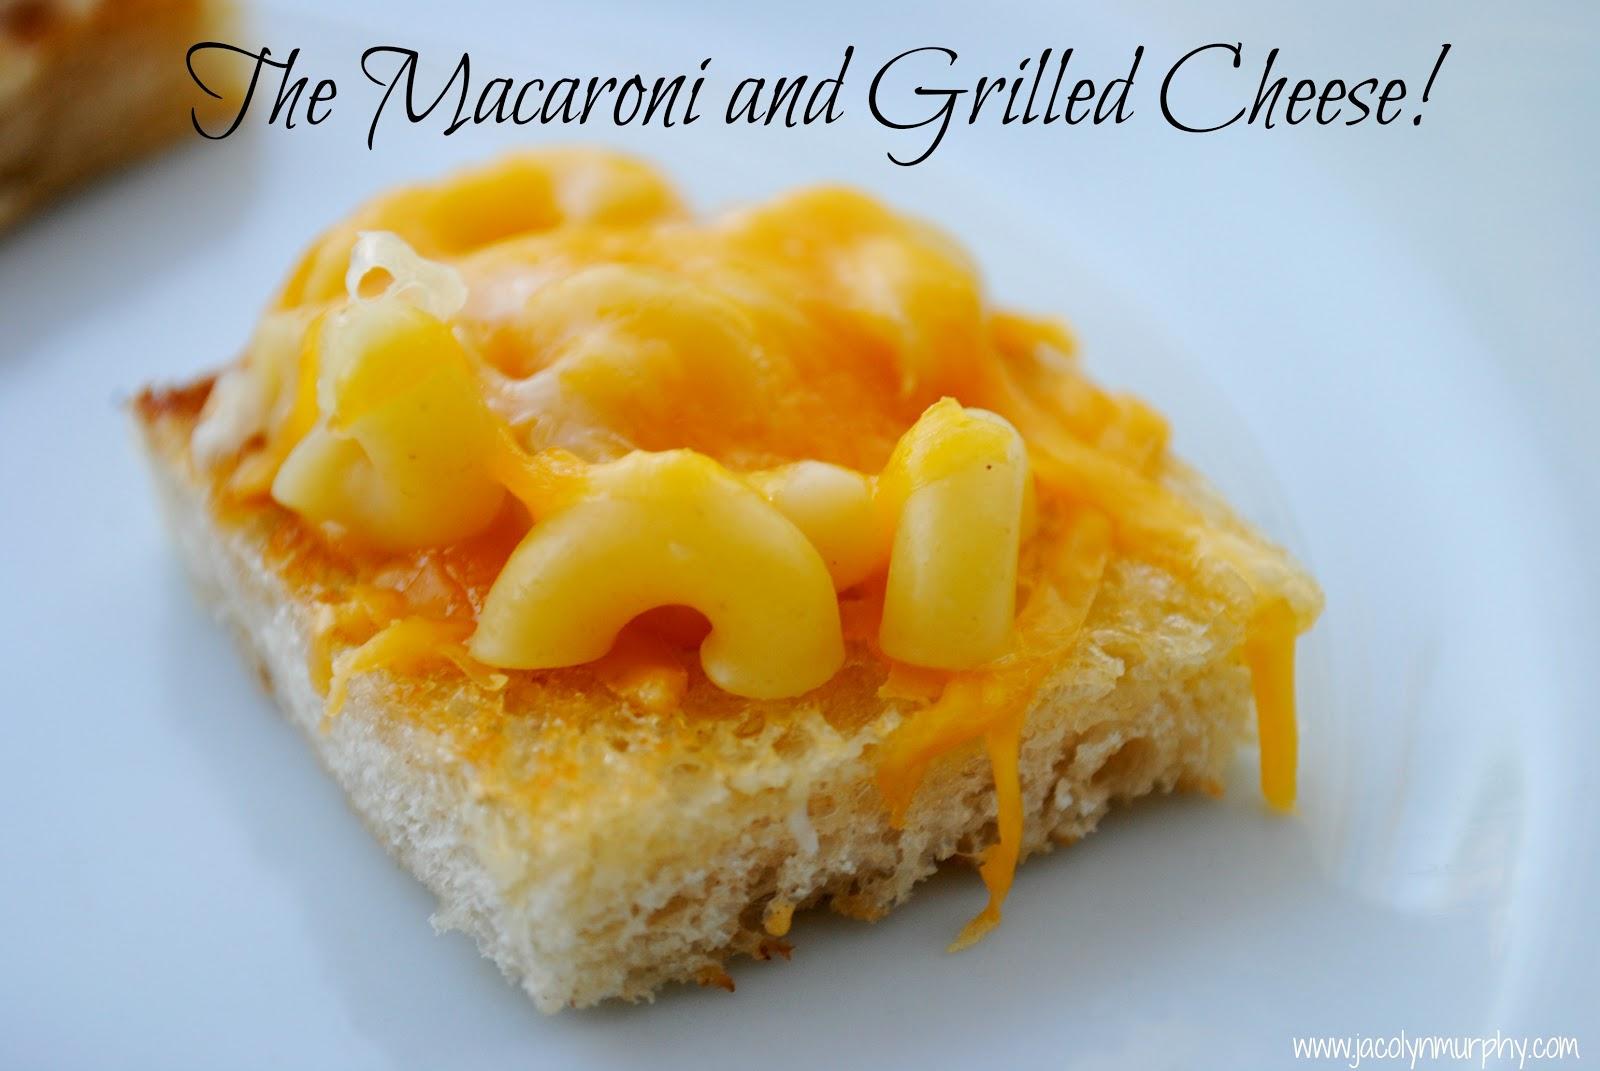 Mac+and+Cheese+done+title.jpg